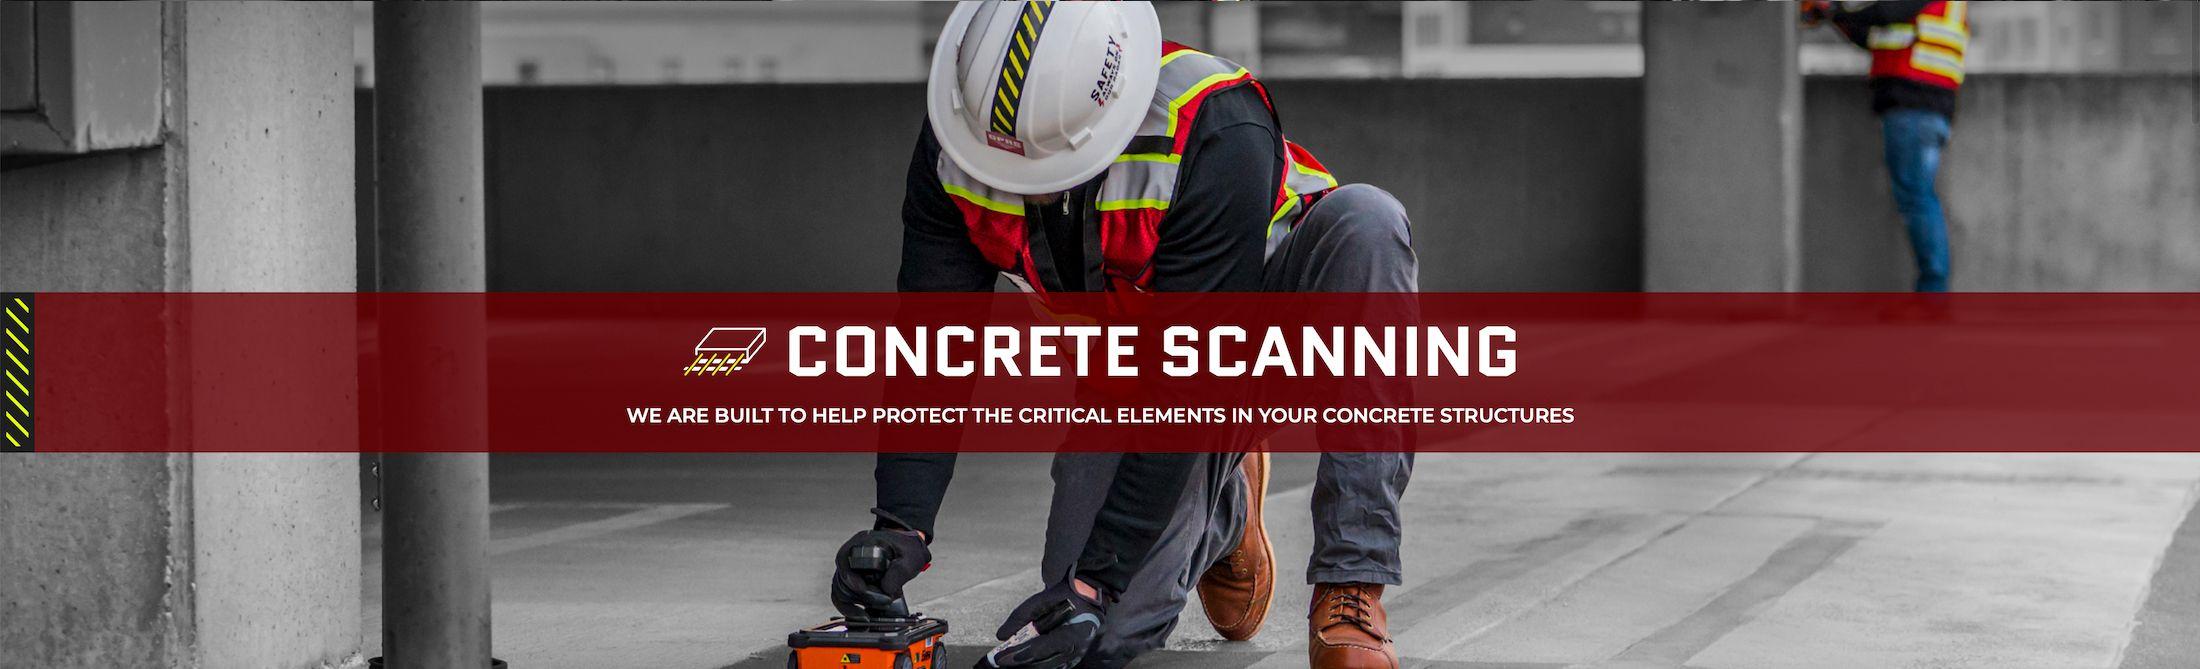 3-concrete-scanning.jpg